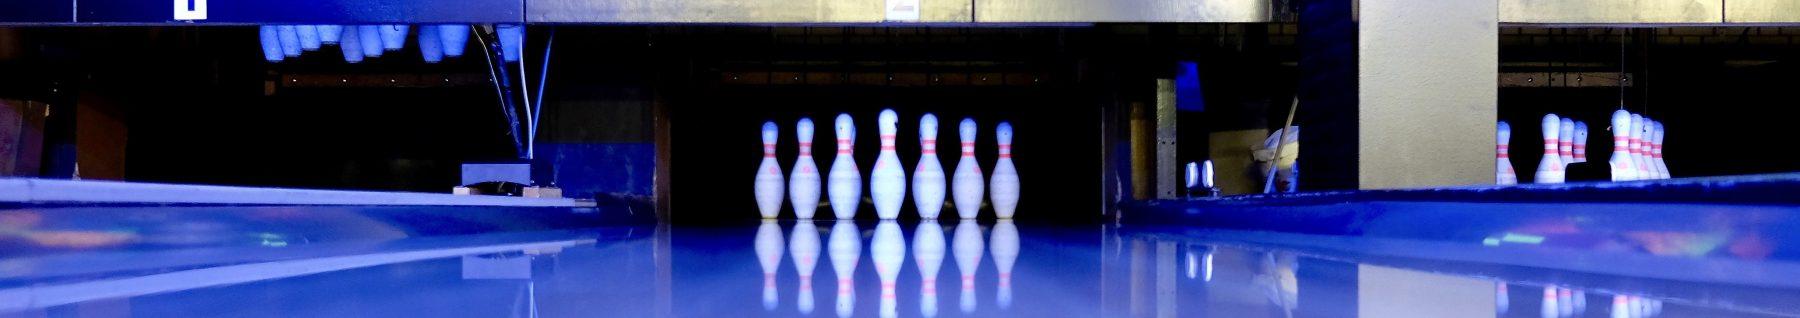 bowling-2585602